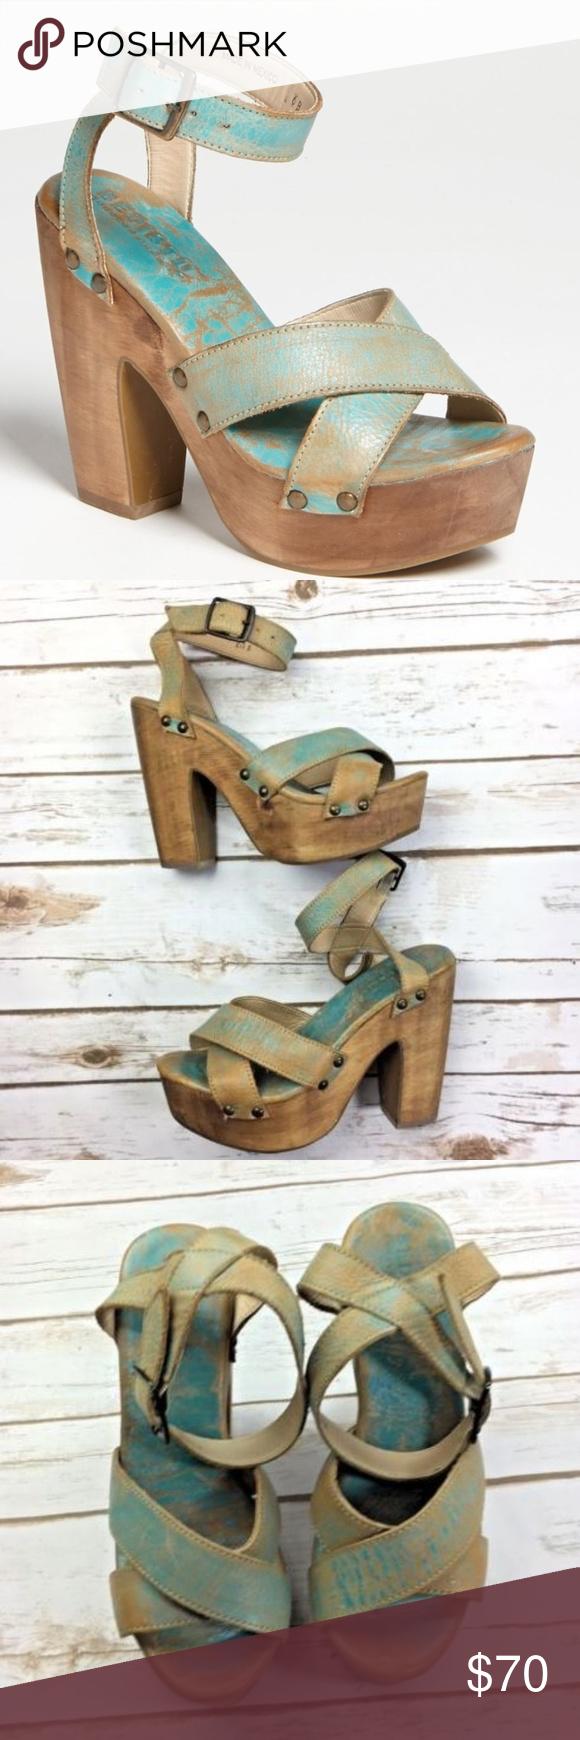 5c398bb05b Bed Stu Madeline Leather Platform Open Toe Heels Bed Stu womens Distressed  Heels size 7.5 Excellent